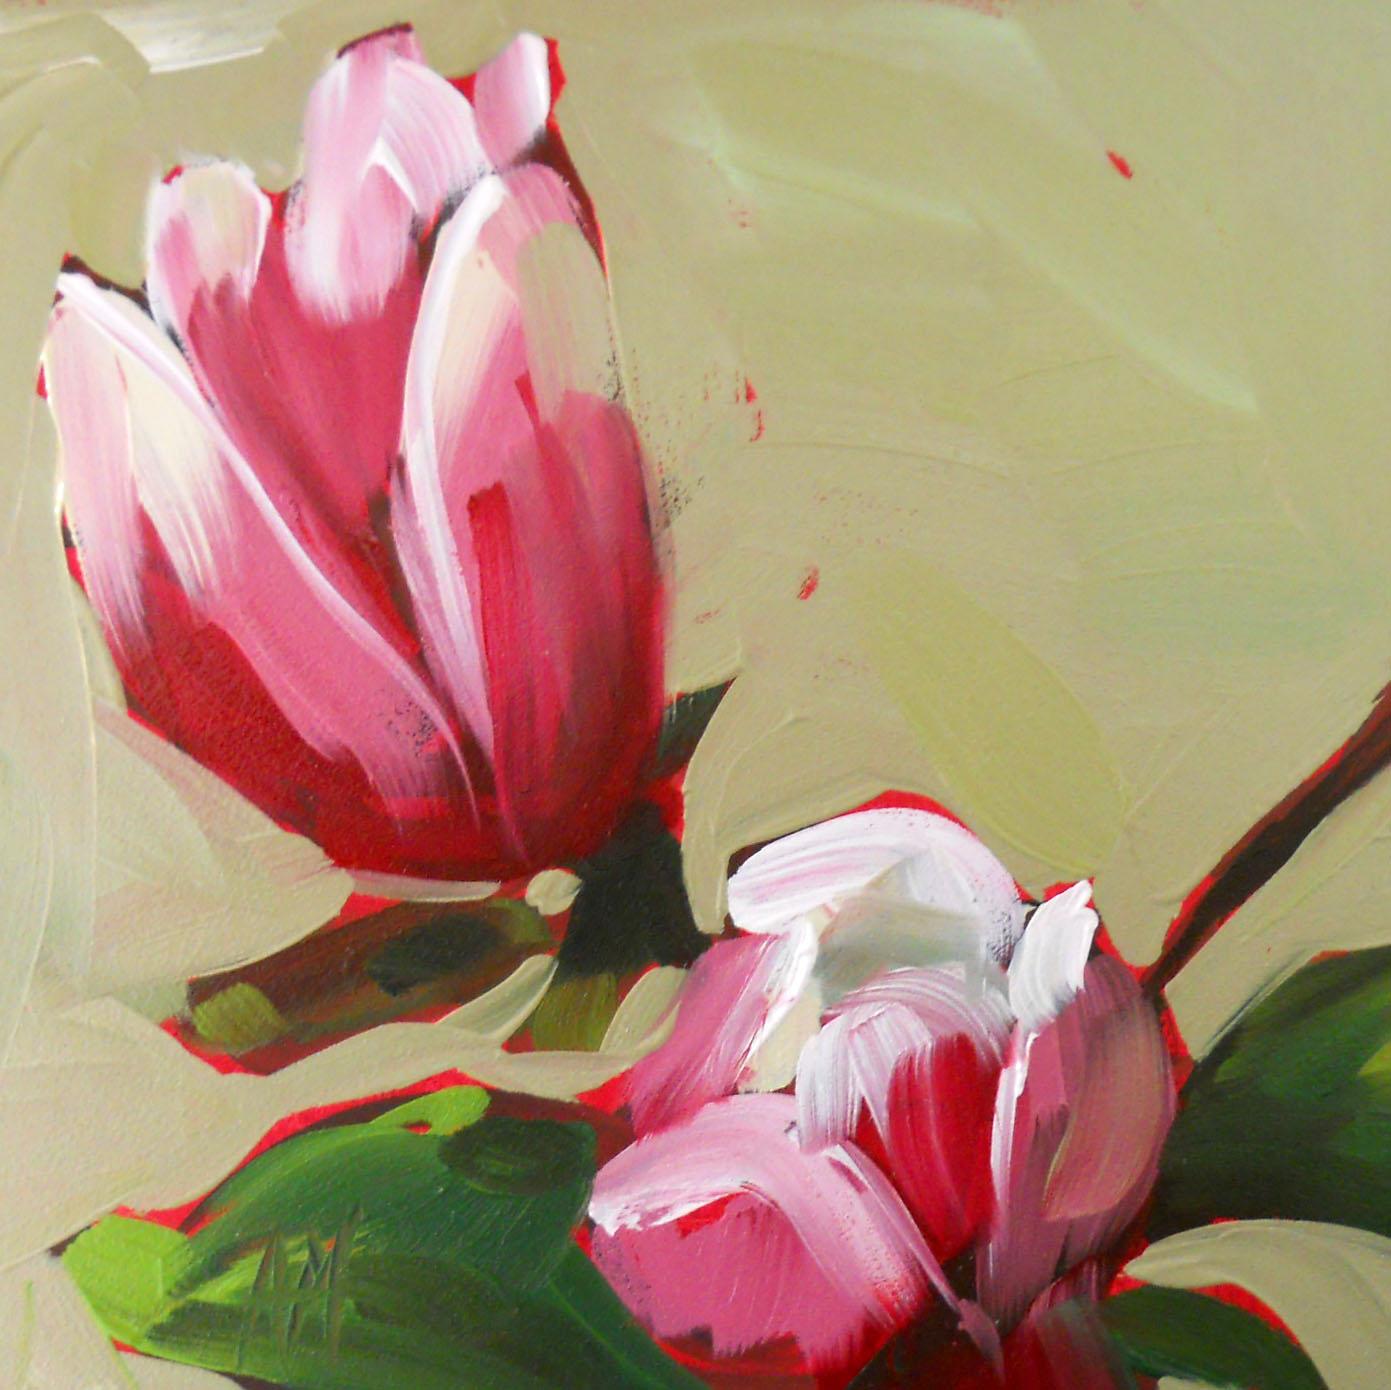 magnolia painting - photo #27